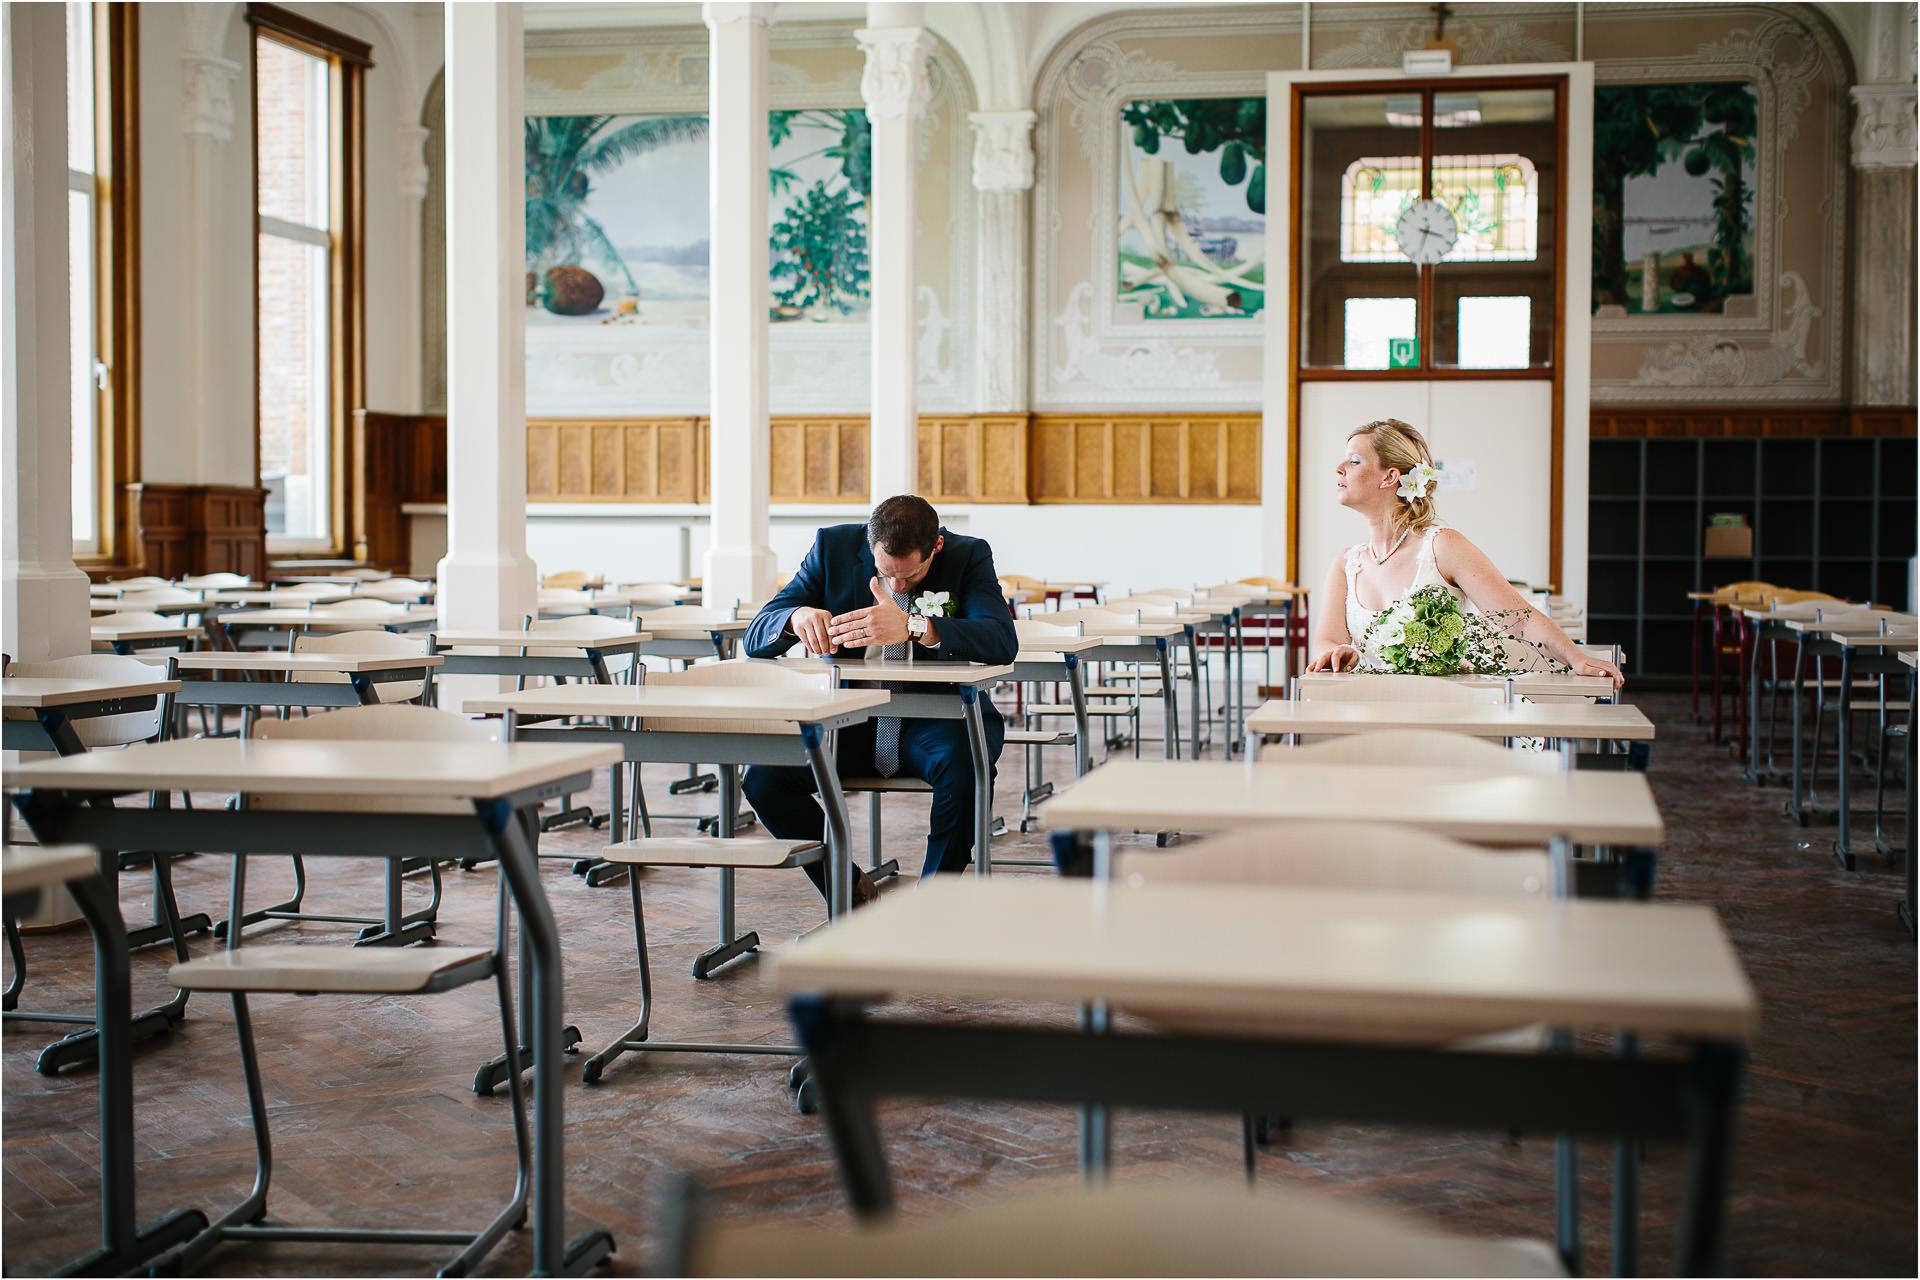 Huwelijksfotograaf Sint-Ursula-Instituut